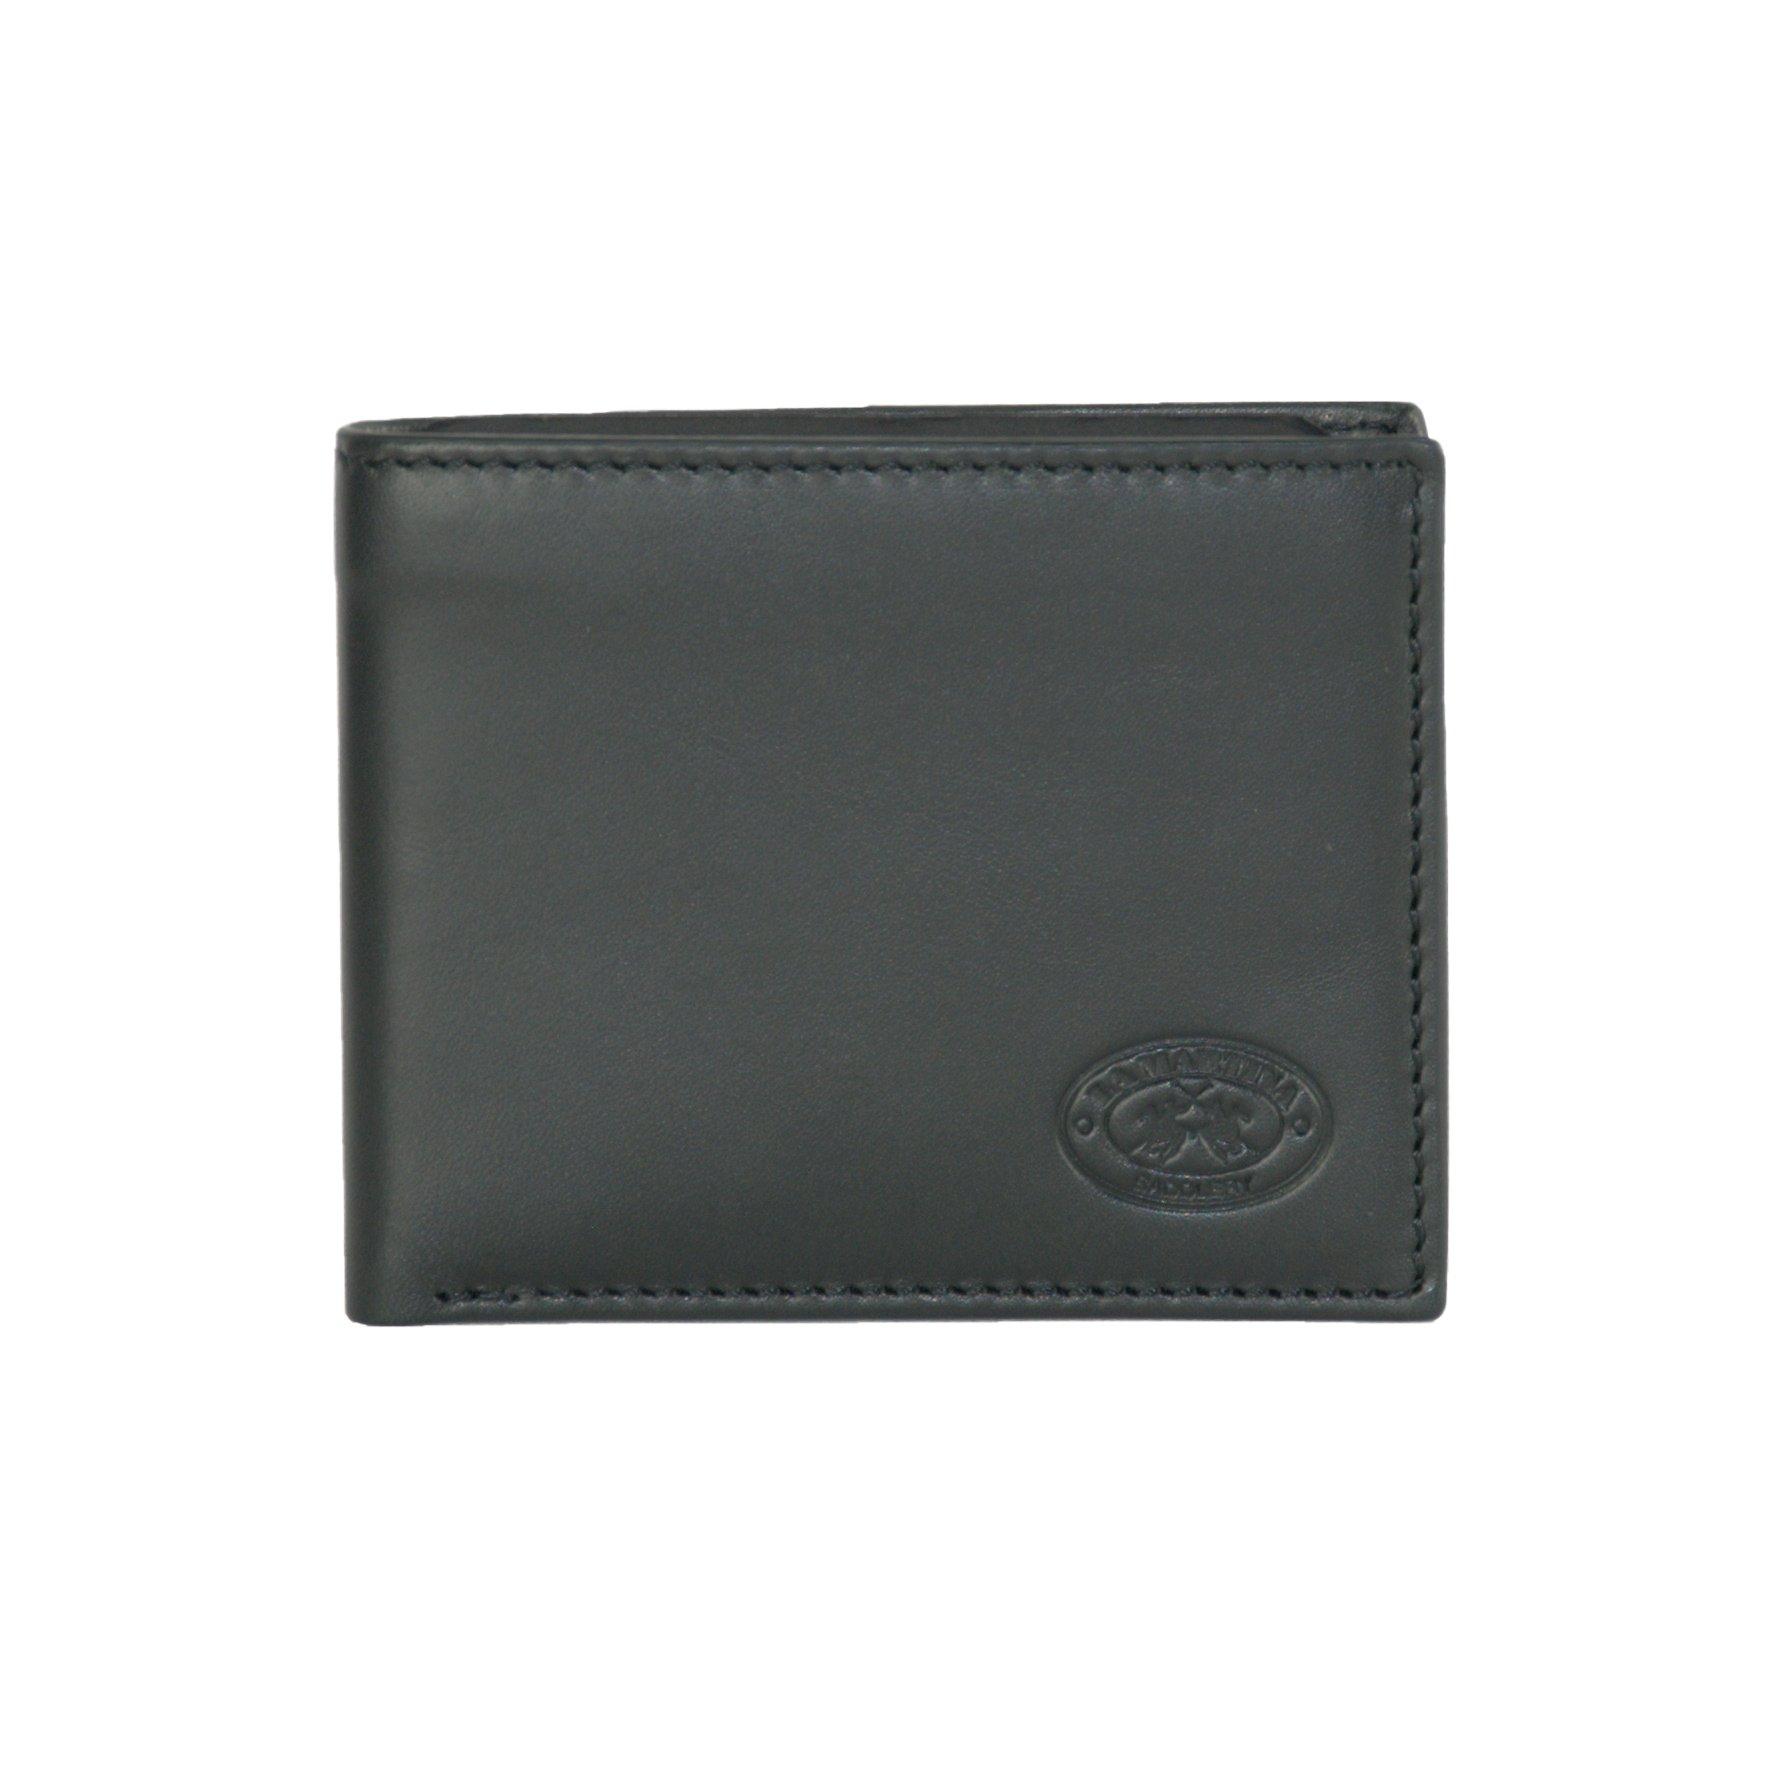 La Martina Men's Wallet Black LA1432655